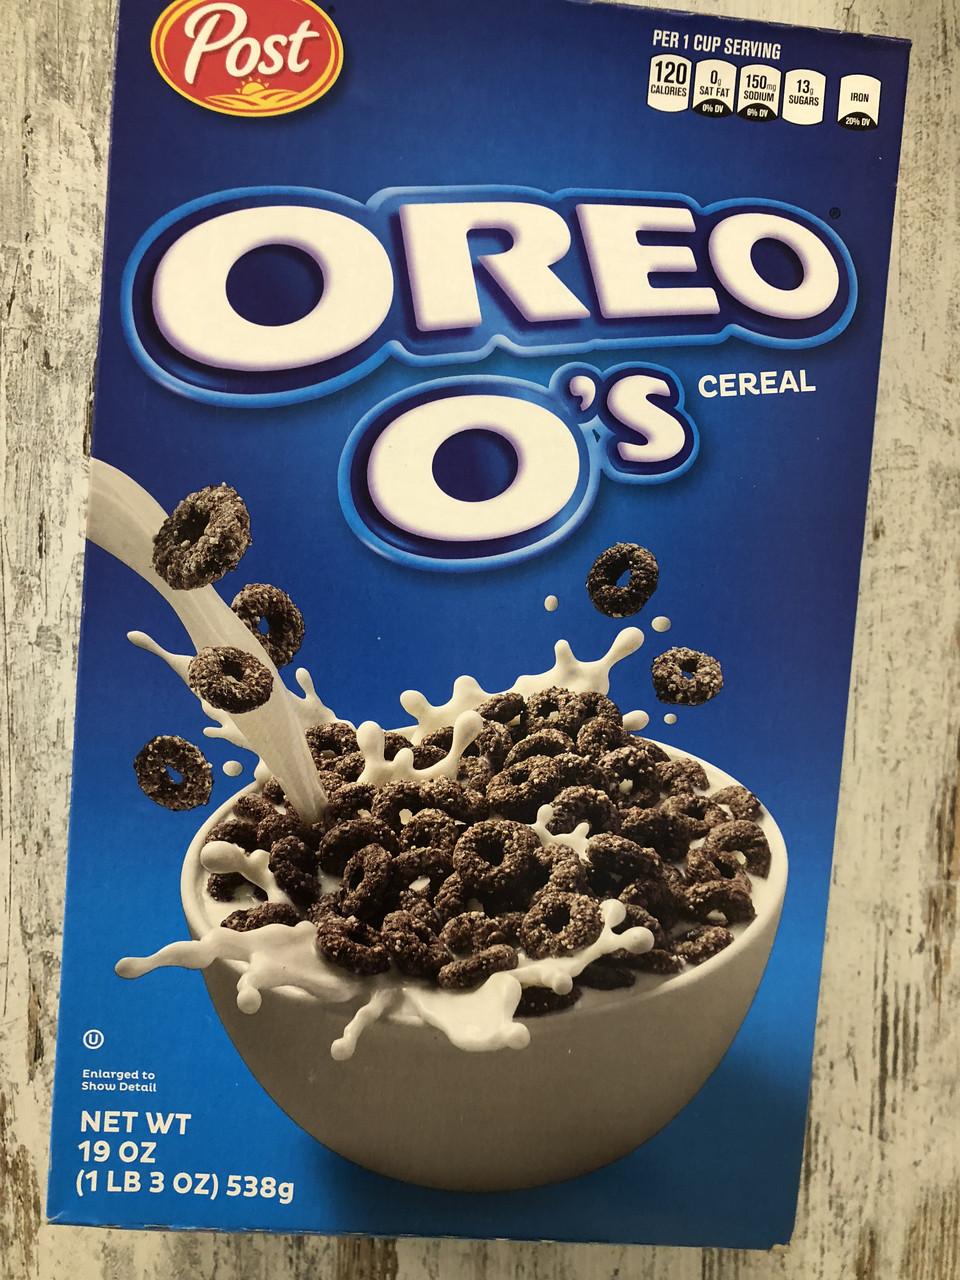 Сухой завтрак хрустящие колечки Oreo O's Cereal